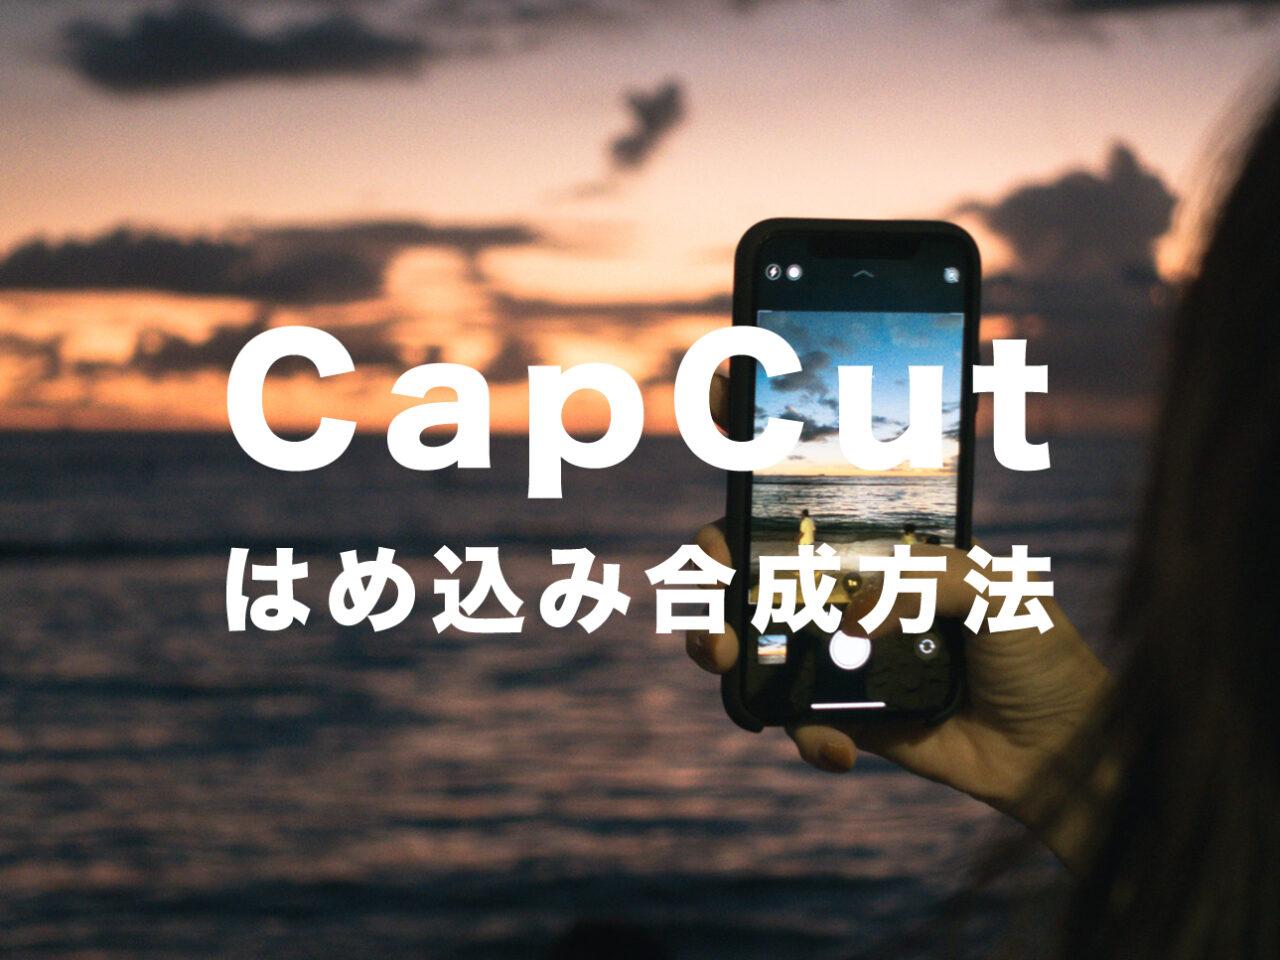 CapCut(キャップカット)ではめ込み合成(背景透過合成)のやり方は?のサムネイル画像